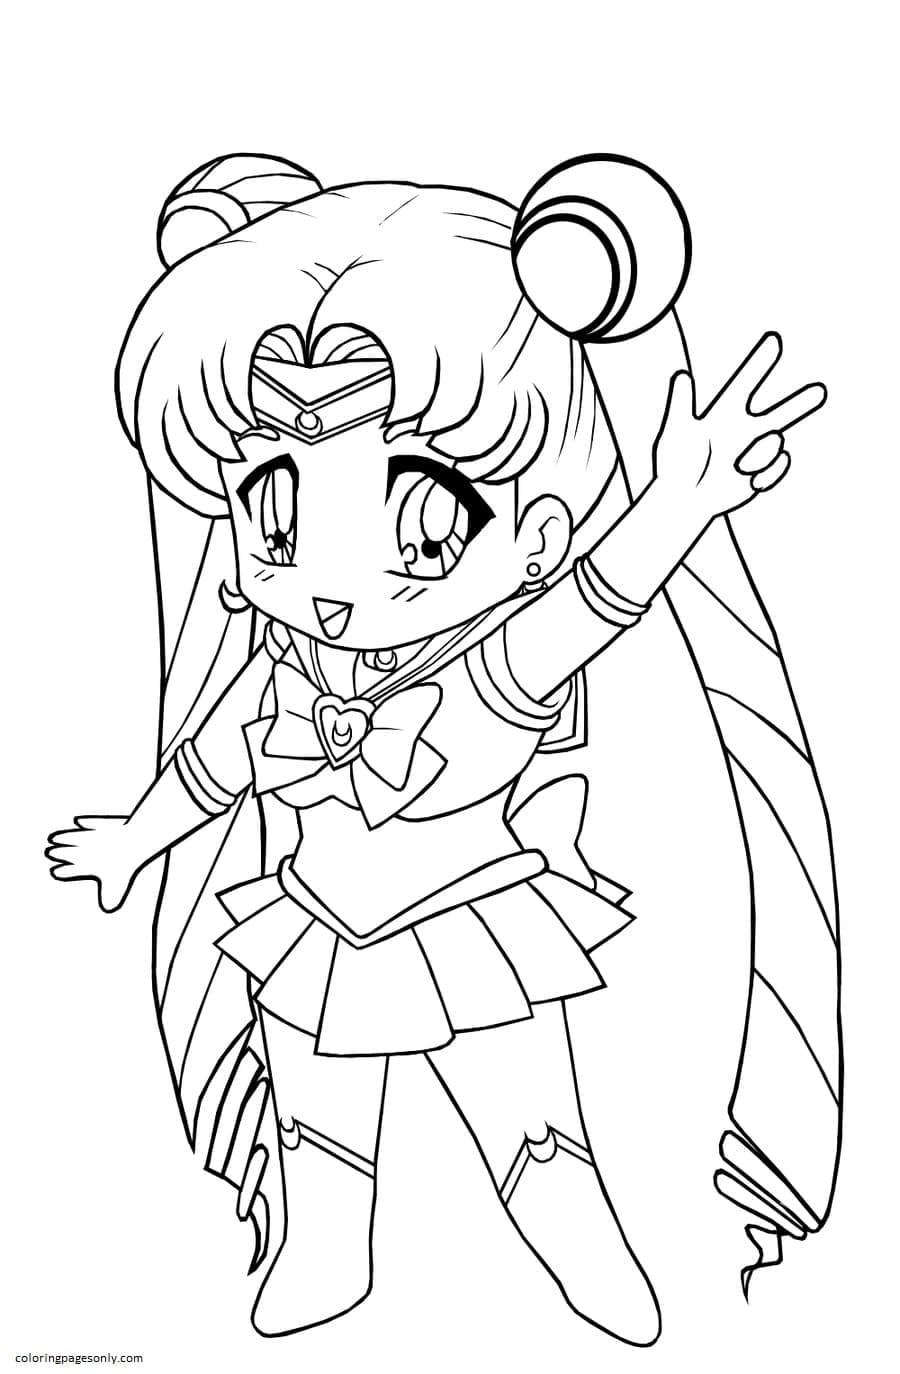 Chibi Sailor Cosmos Coloring Page